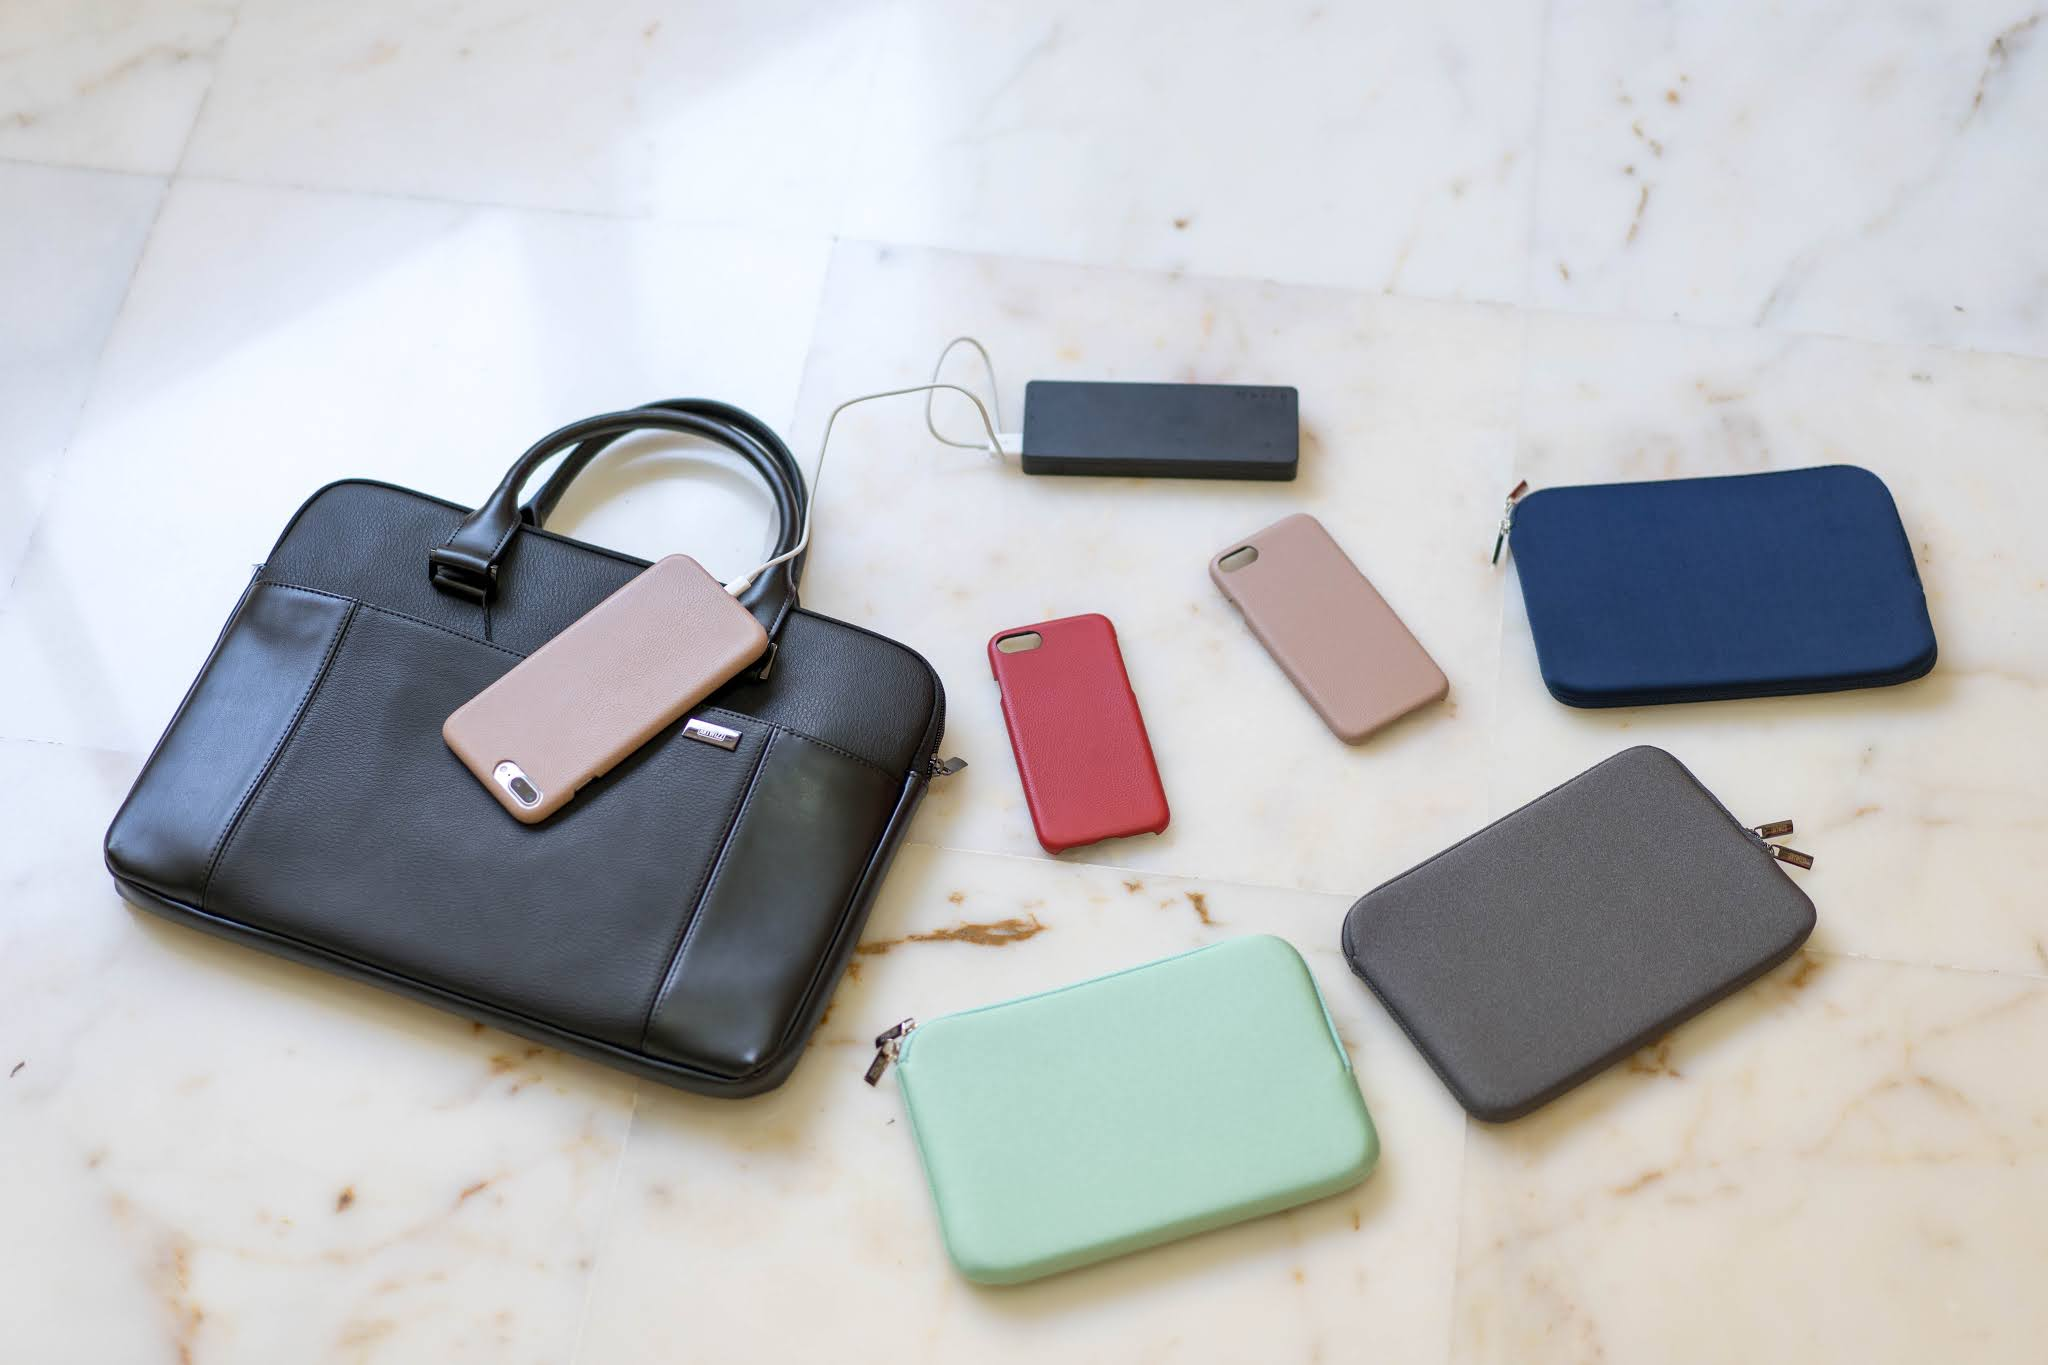 "Artwizz Leather Bag per MacBook 15""; le Cable Sleeve Neopren-Tasche nelle nuance Navy, Mint e Titan; il Lightning Cable 0,5 m per iPhone, iPad & iPod; le Leather Case per iPhone 8 Plus & iPhone 7 Plus in Nude e Red"